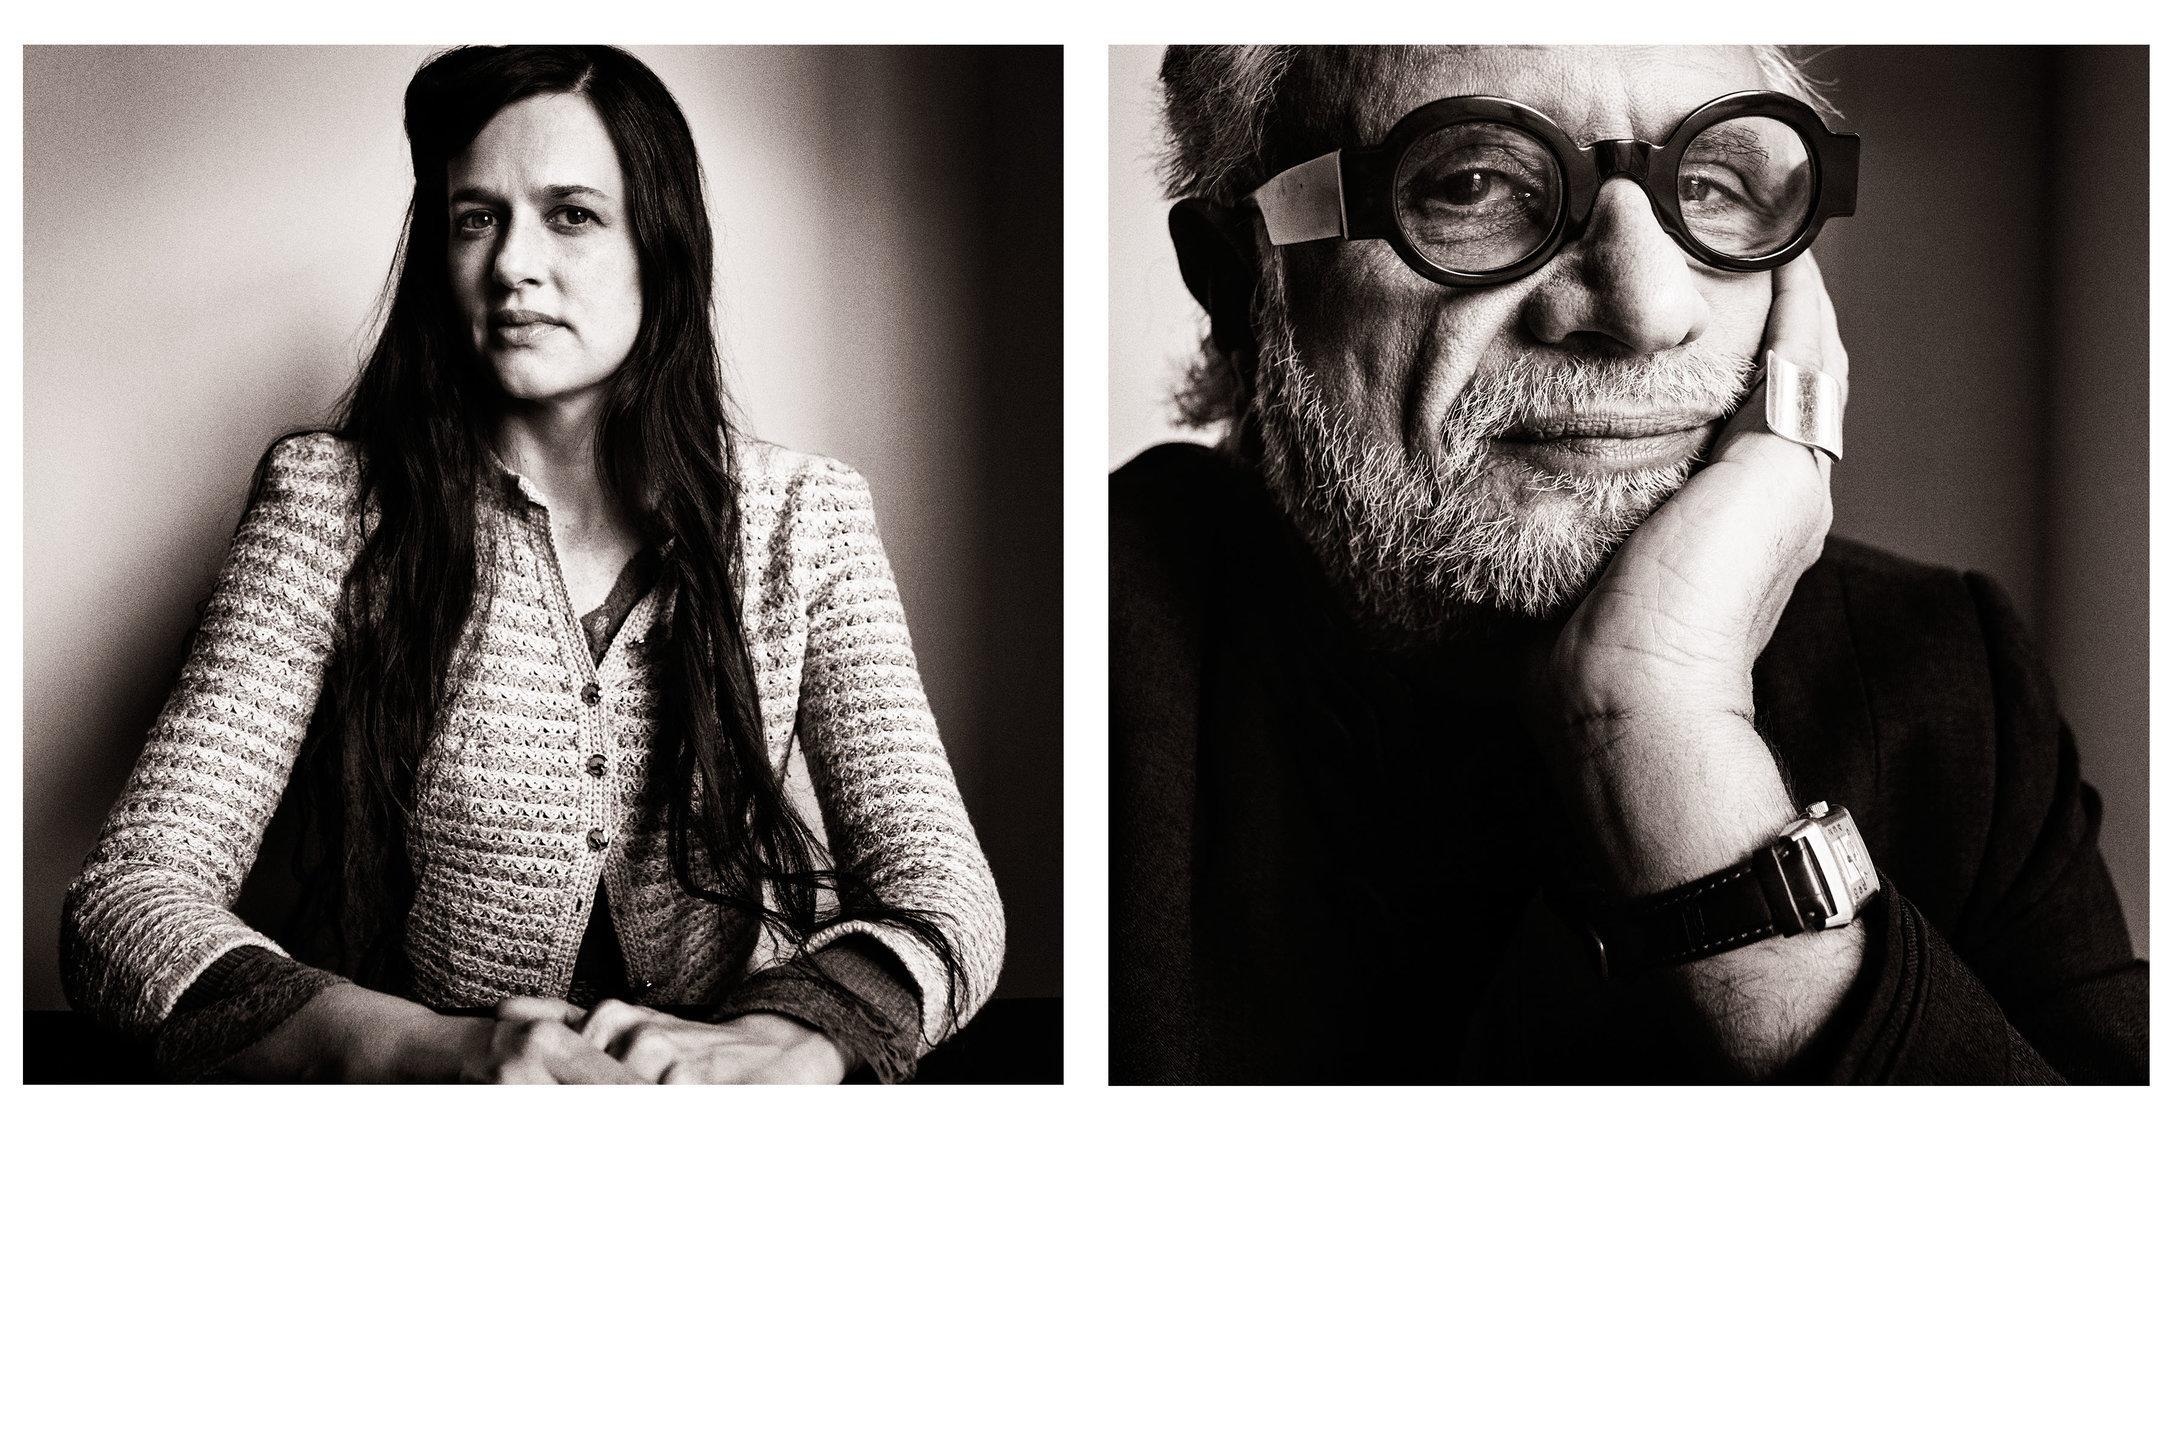 German Vogue. Taryn Simon and Homi K. Bhabha. April 2016.